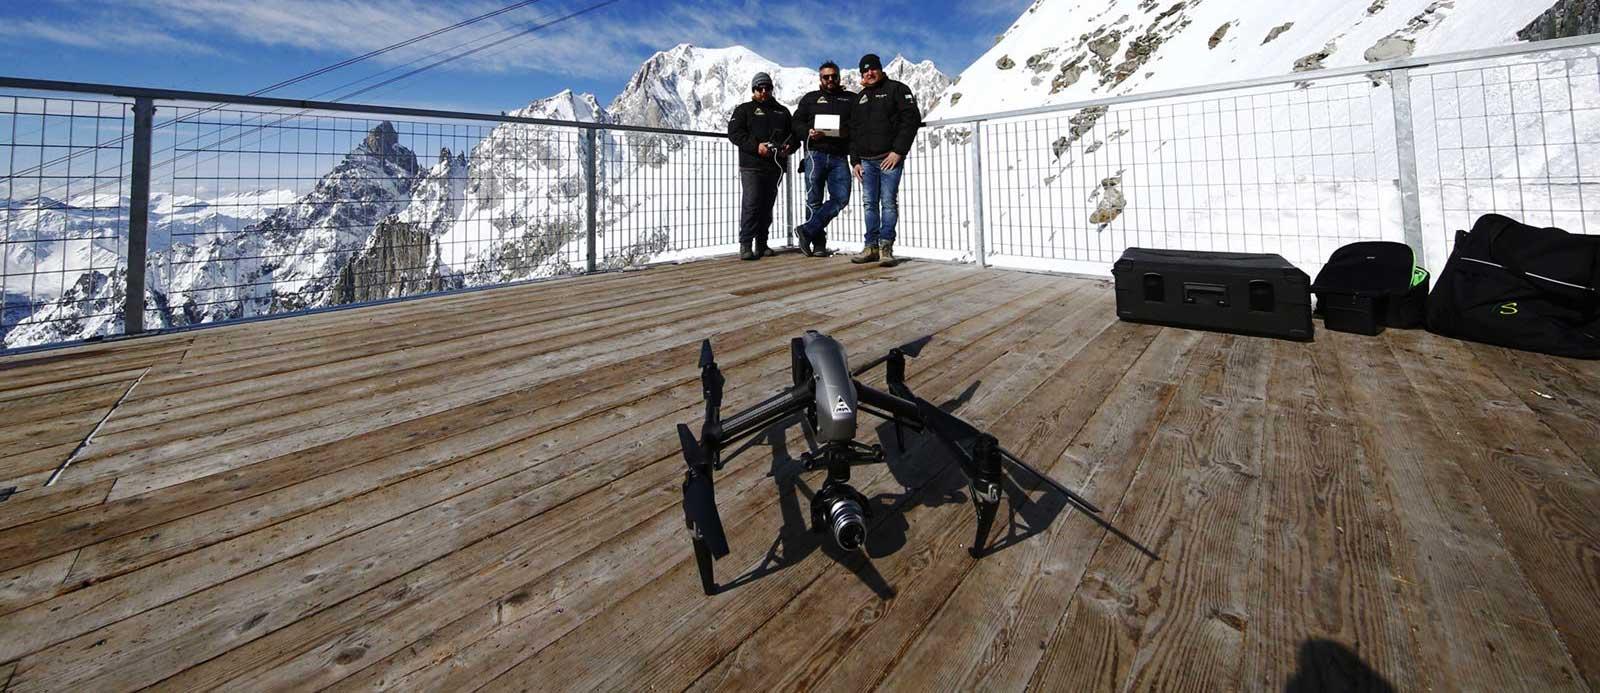 i professionisti dei droni